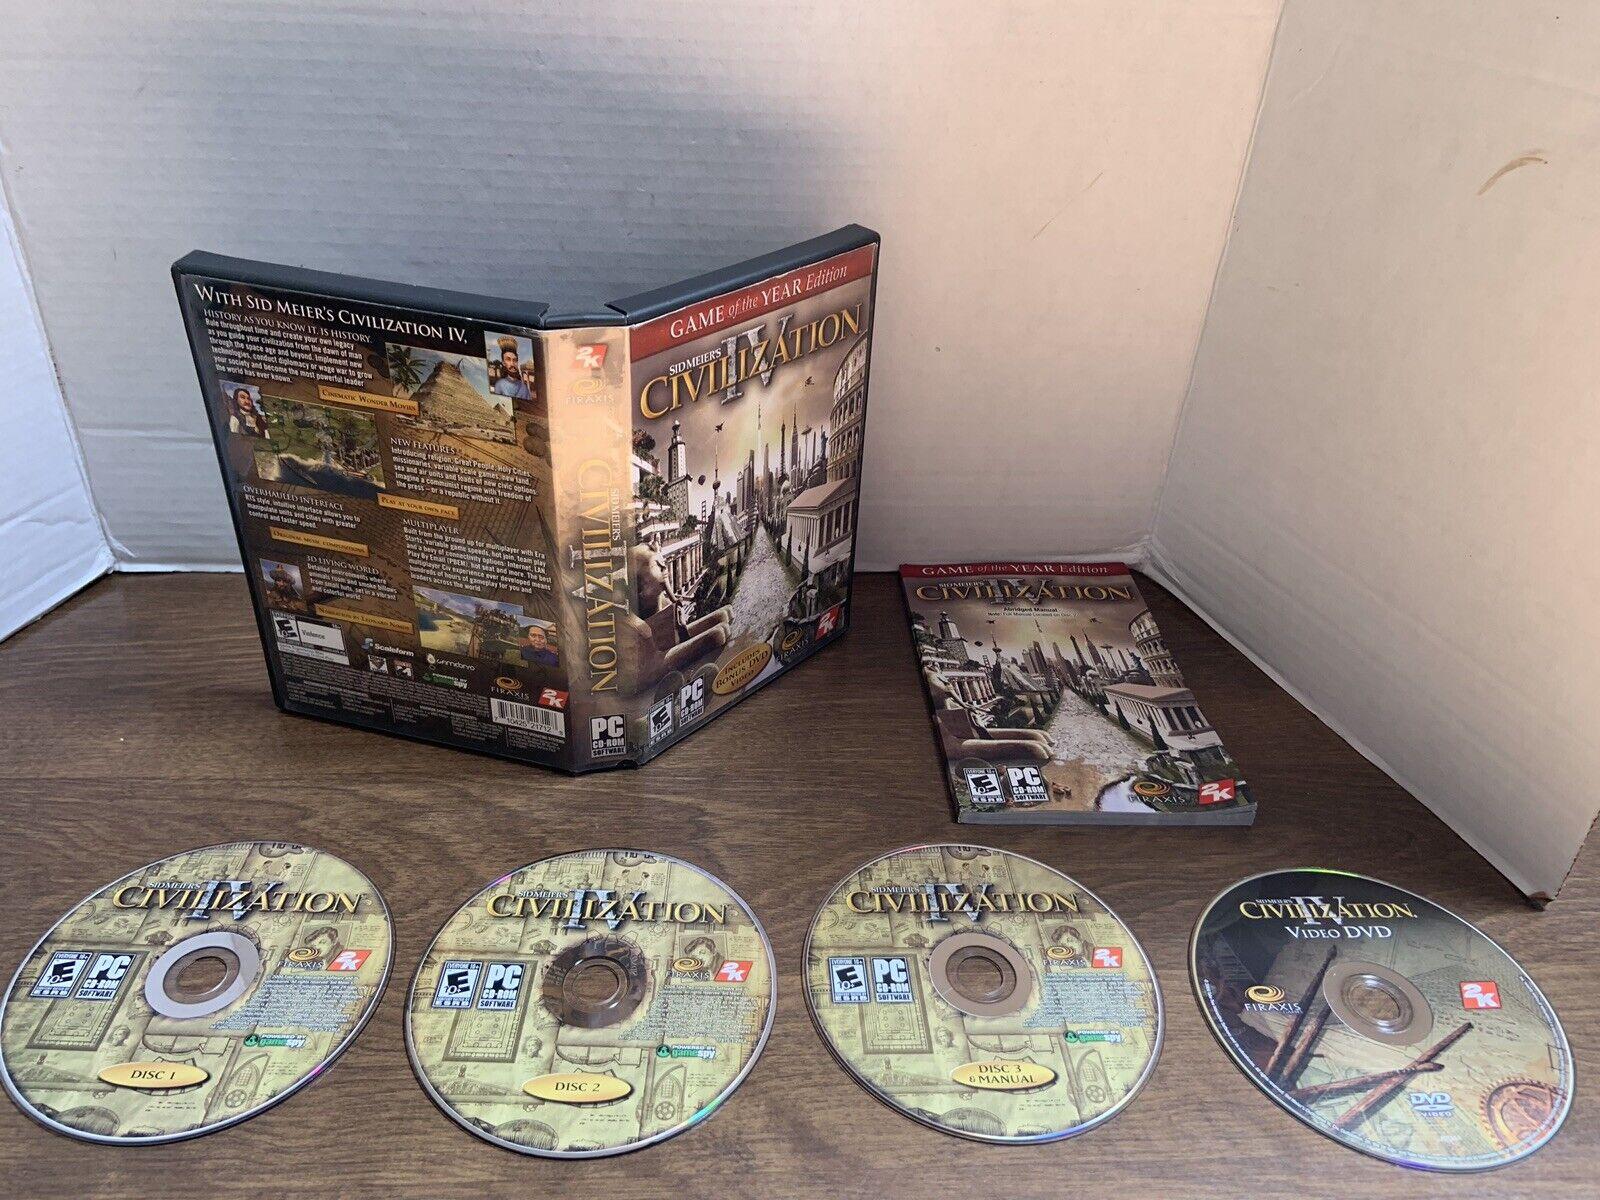 Sid Meier's CIVILIZATION IV Game Of The Year PC CD ROM original box 4 CDs  manual | eBay